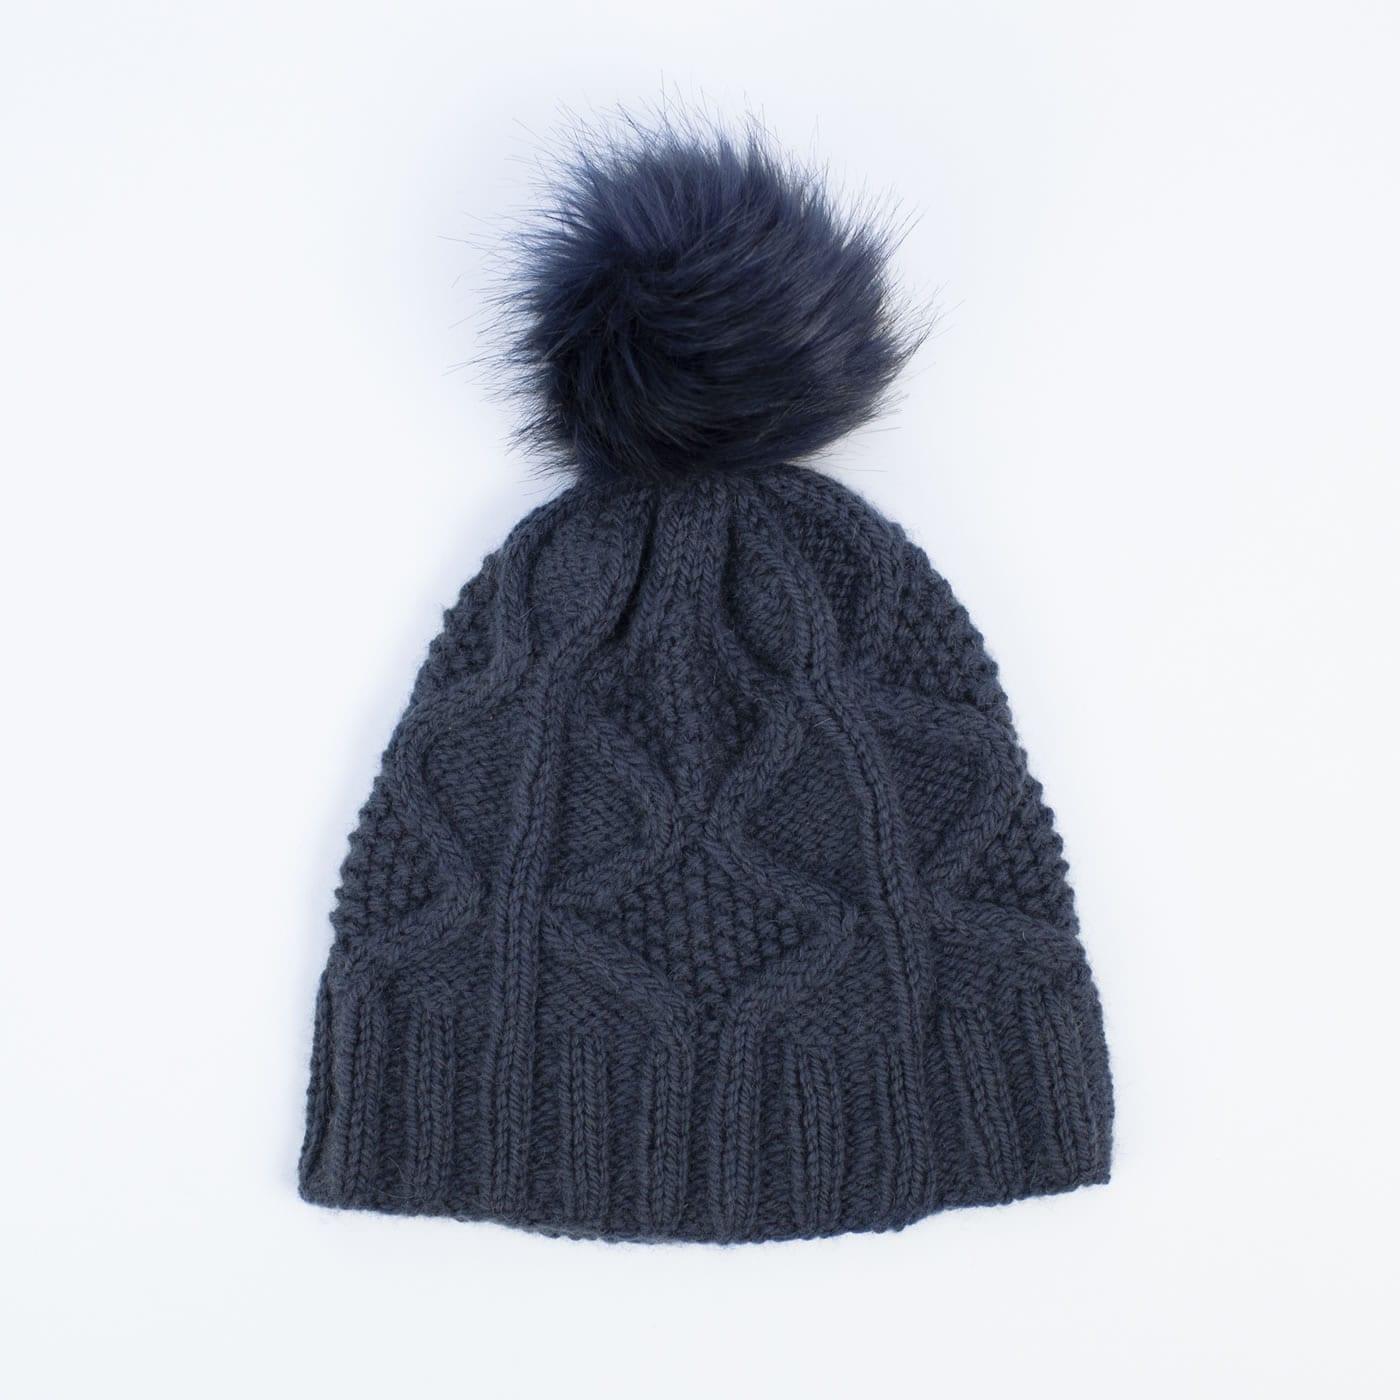 The Woven Alpine Beanie Knit Kit